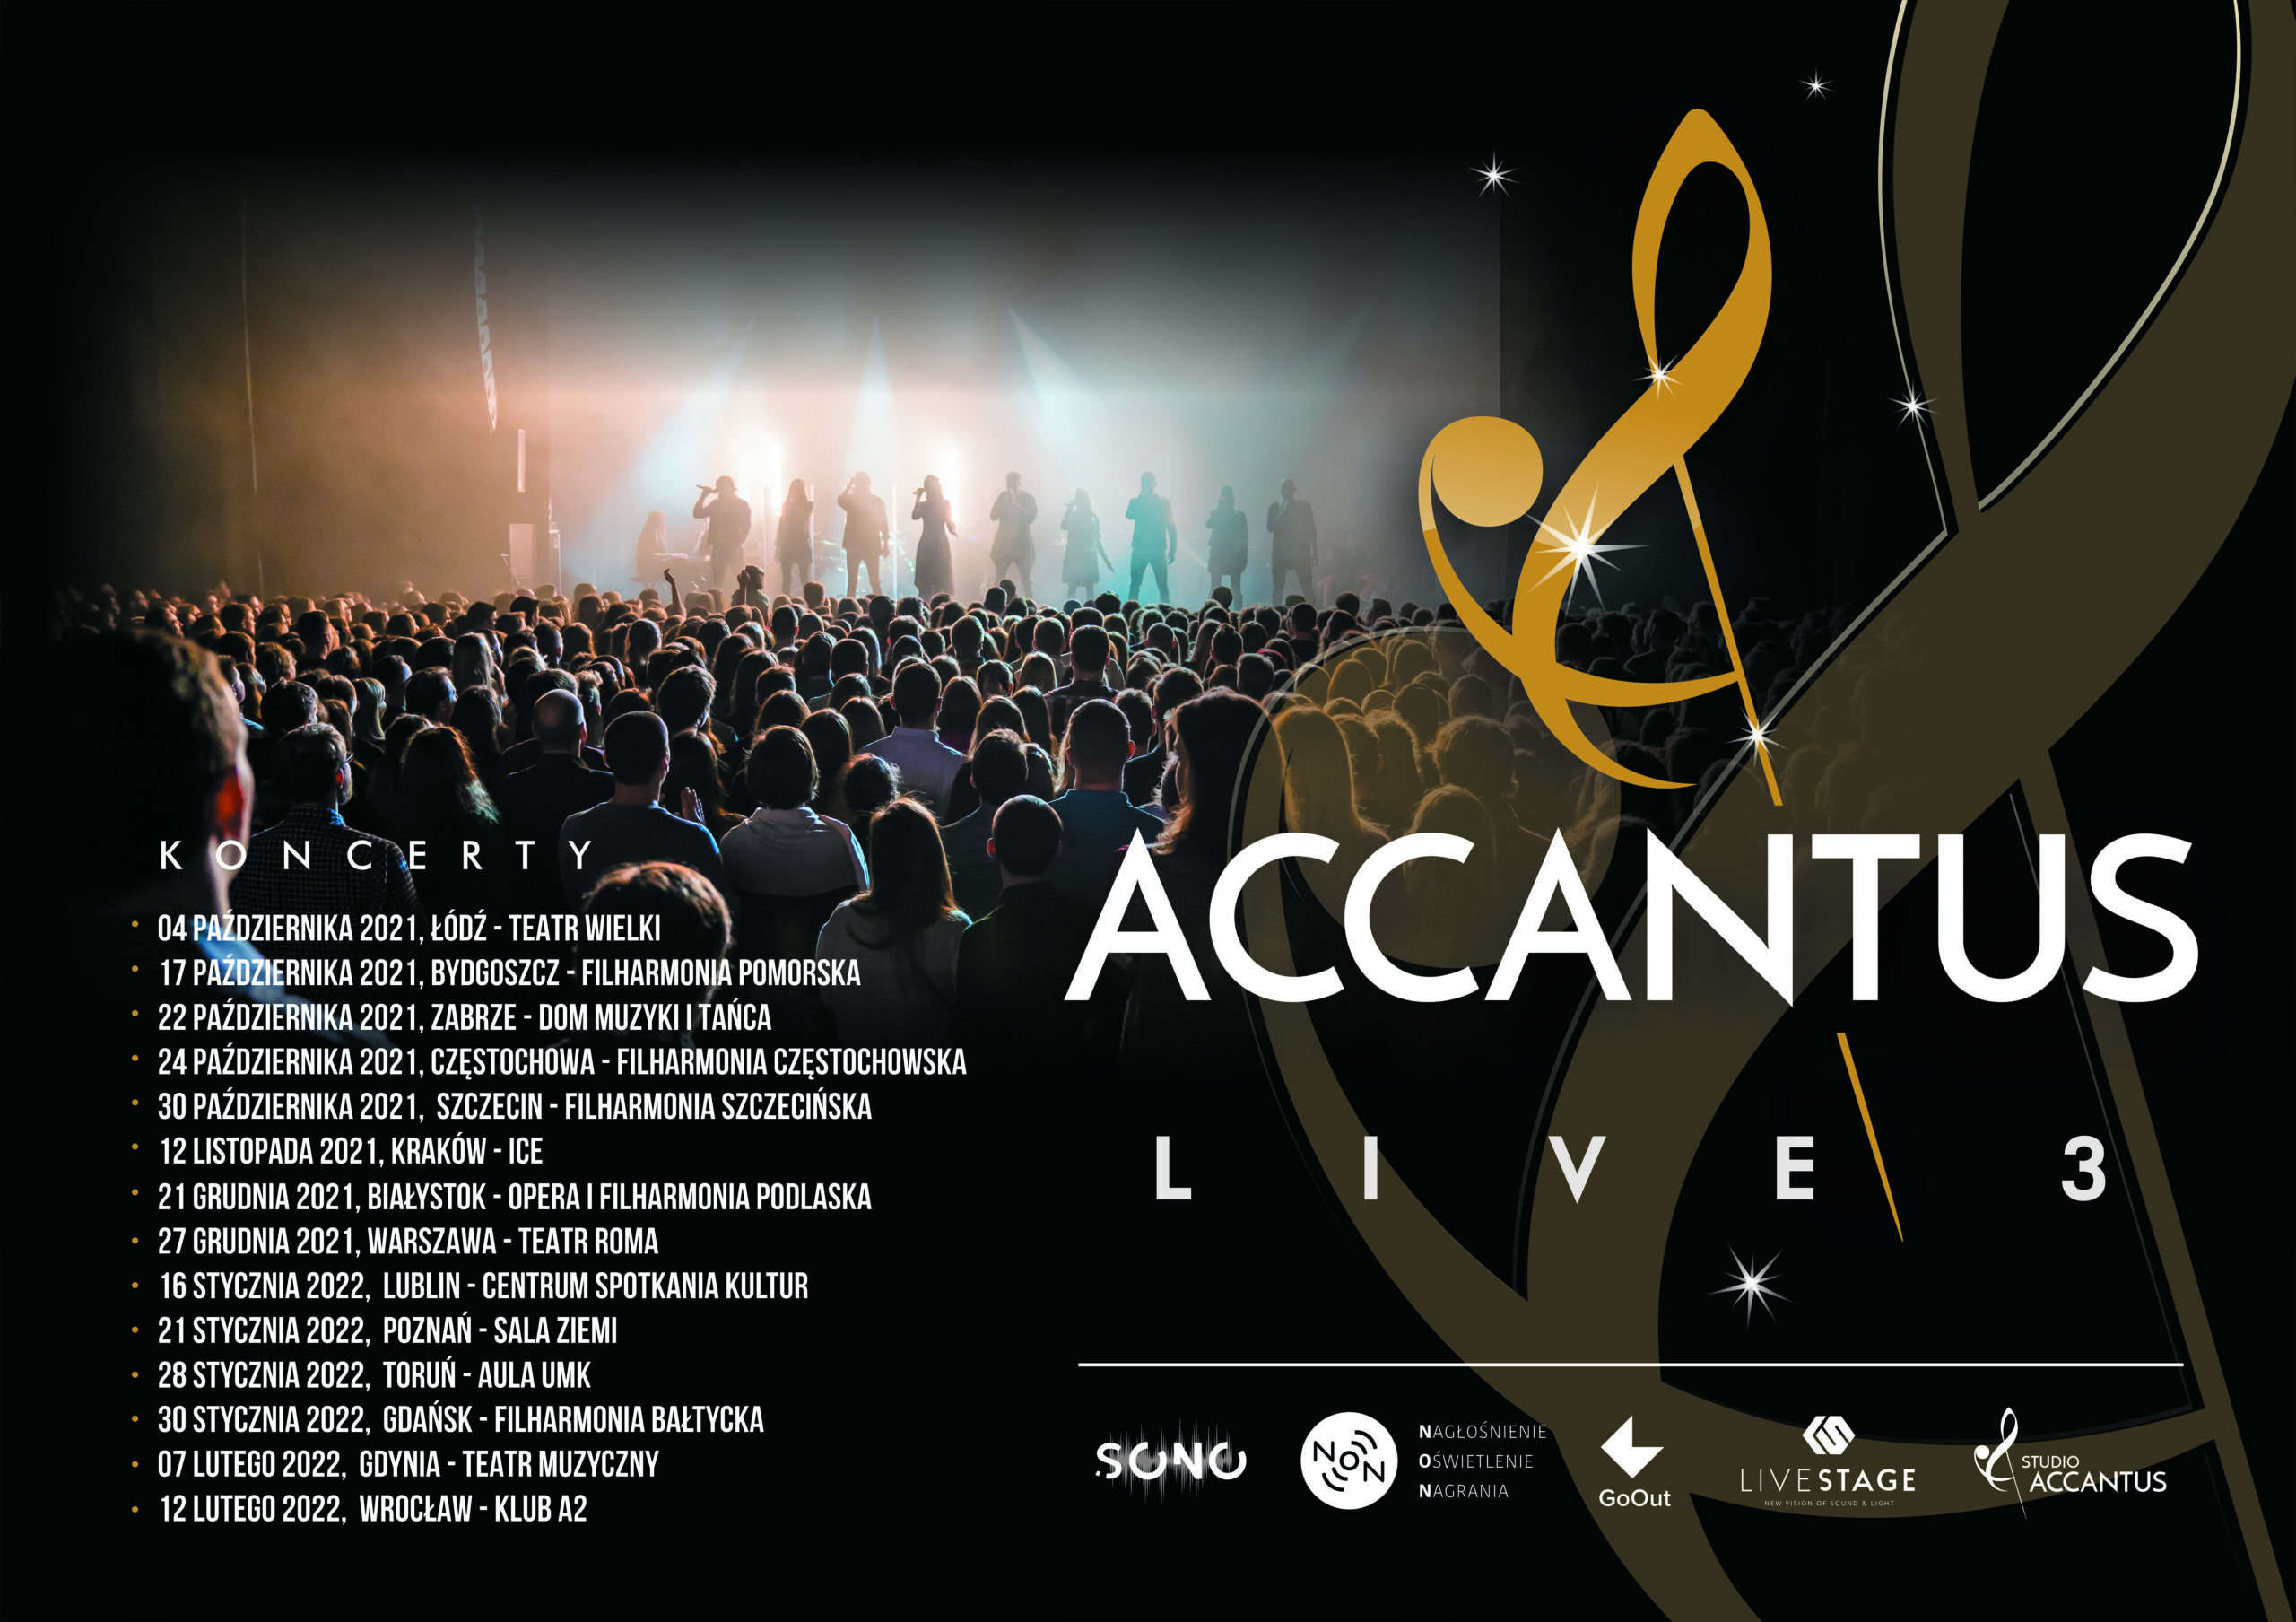 Plakat Accantus Live 3